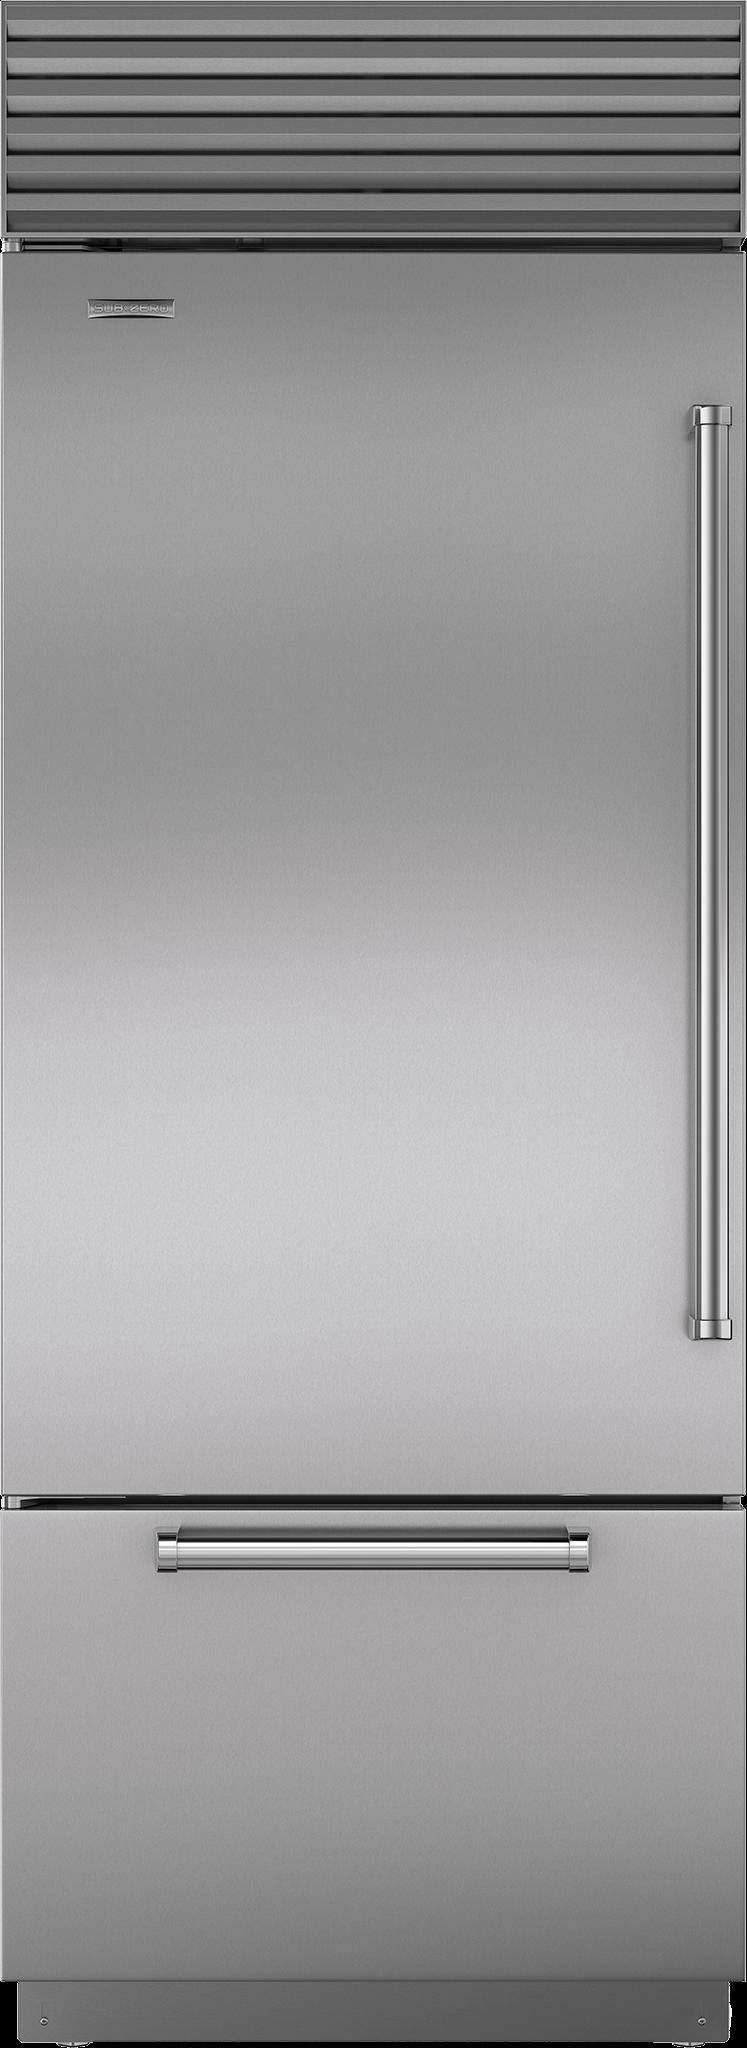 "Subzero30"" Classic Over-And-Under Refrigerator/freezer"